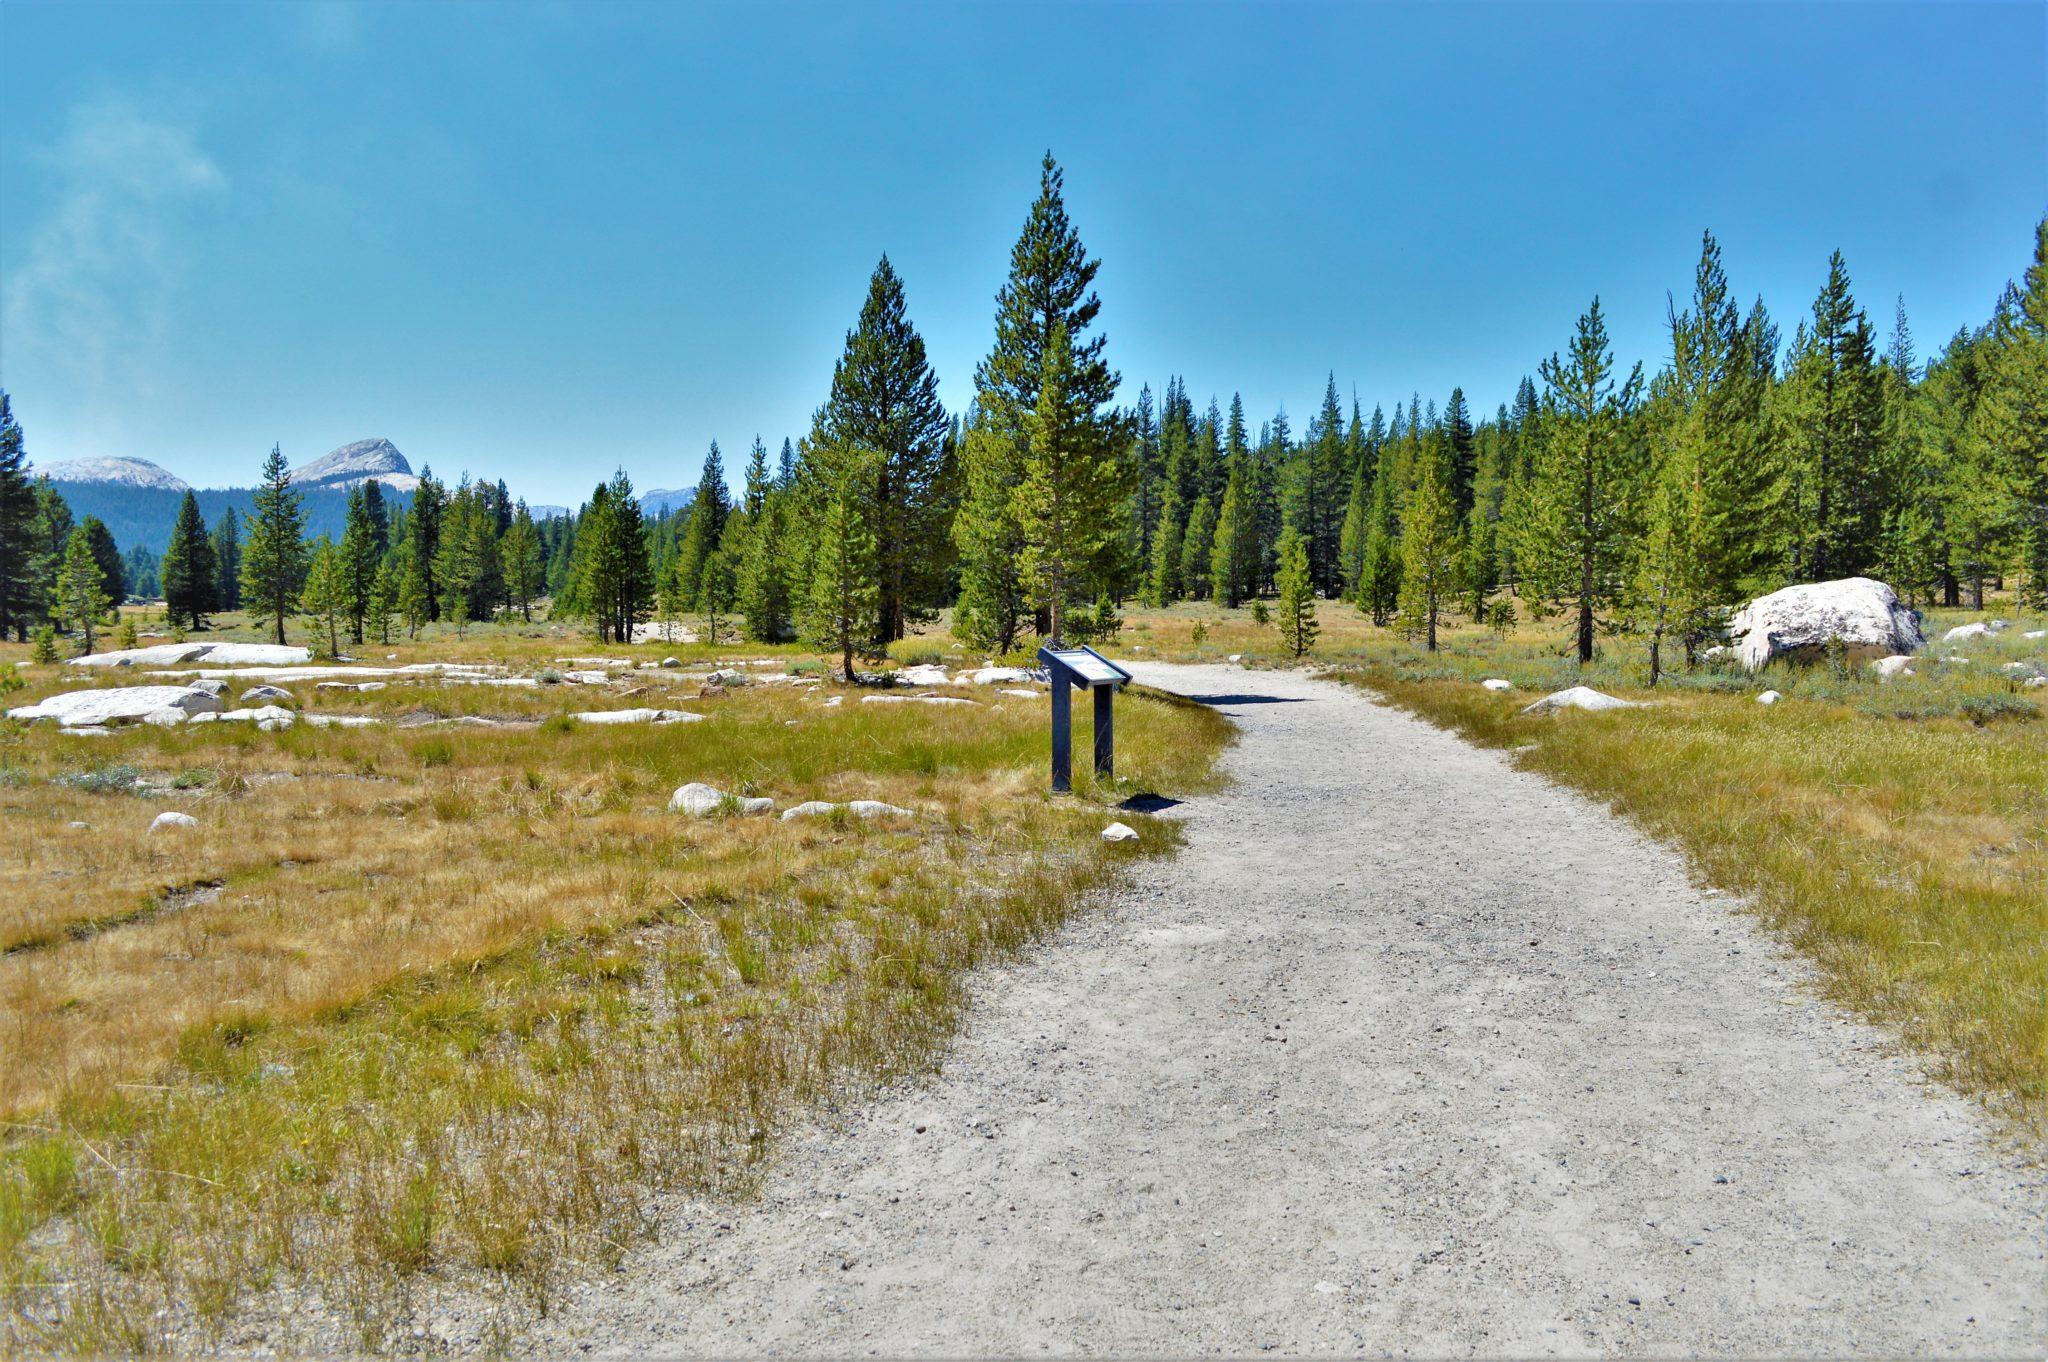 Trail in Yosemite National Park, California